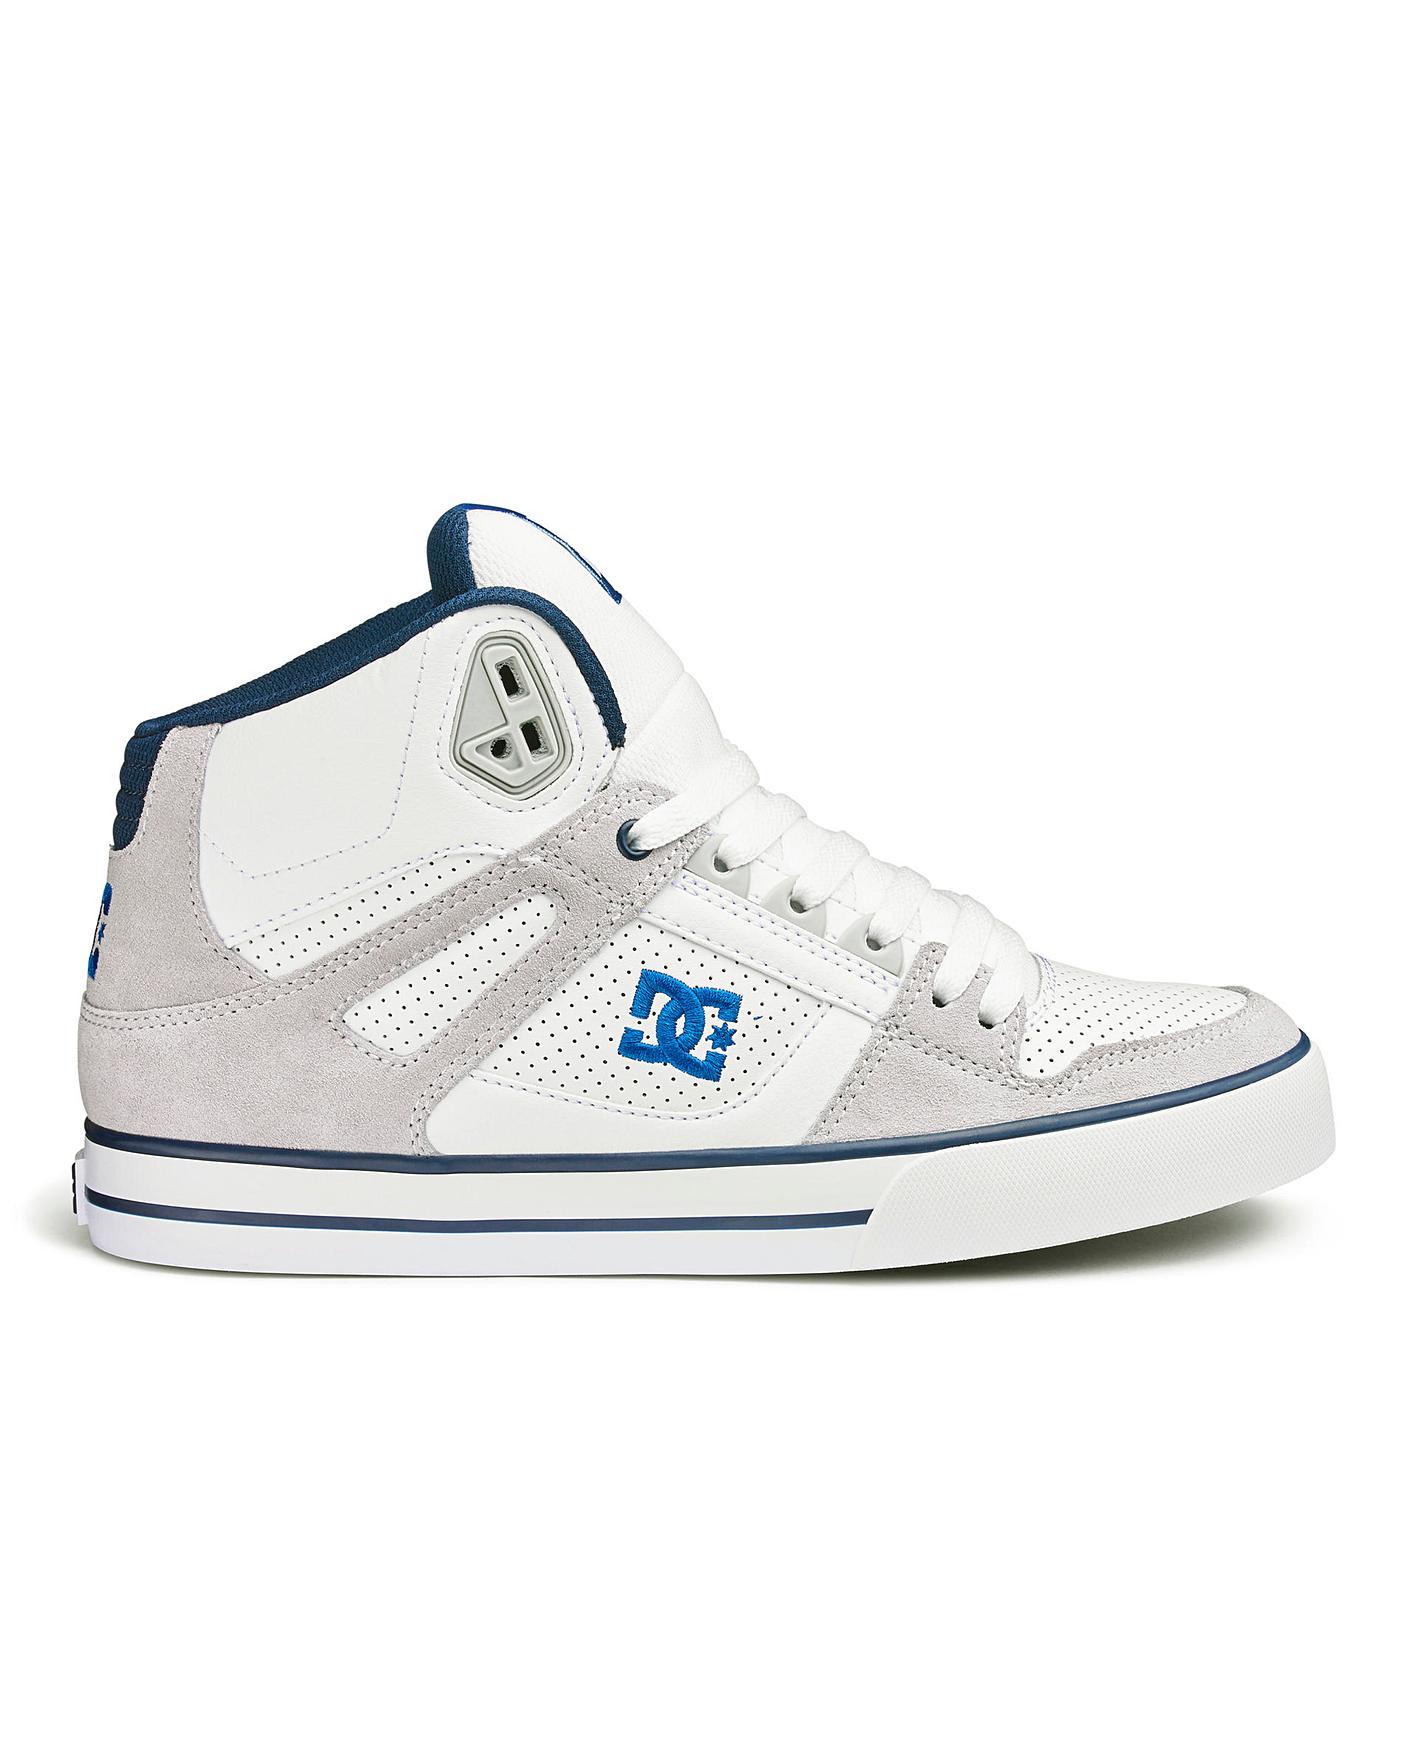 DC Shoes Pure High-Top Trainers | Jacamo